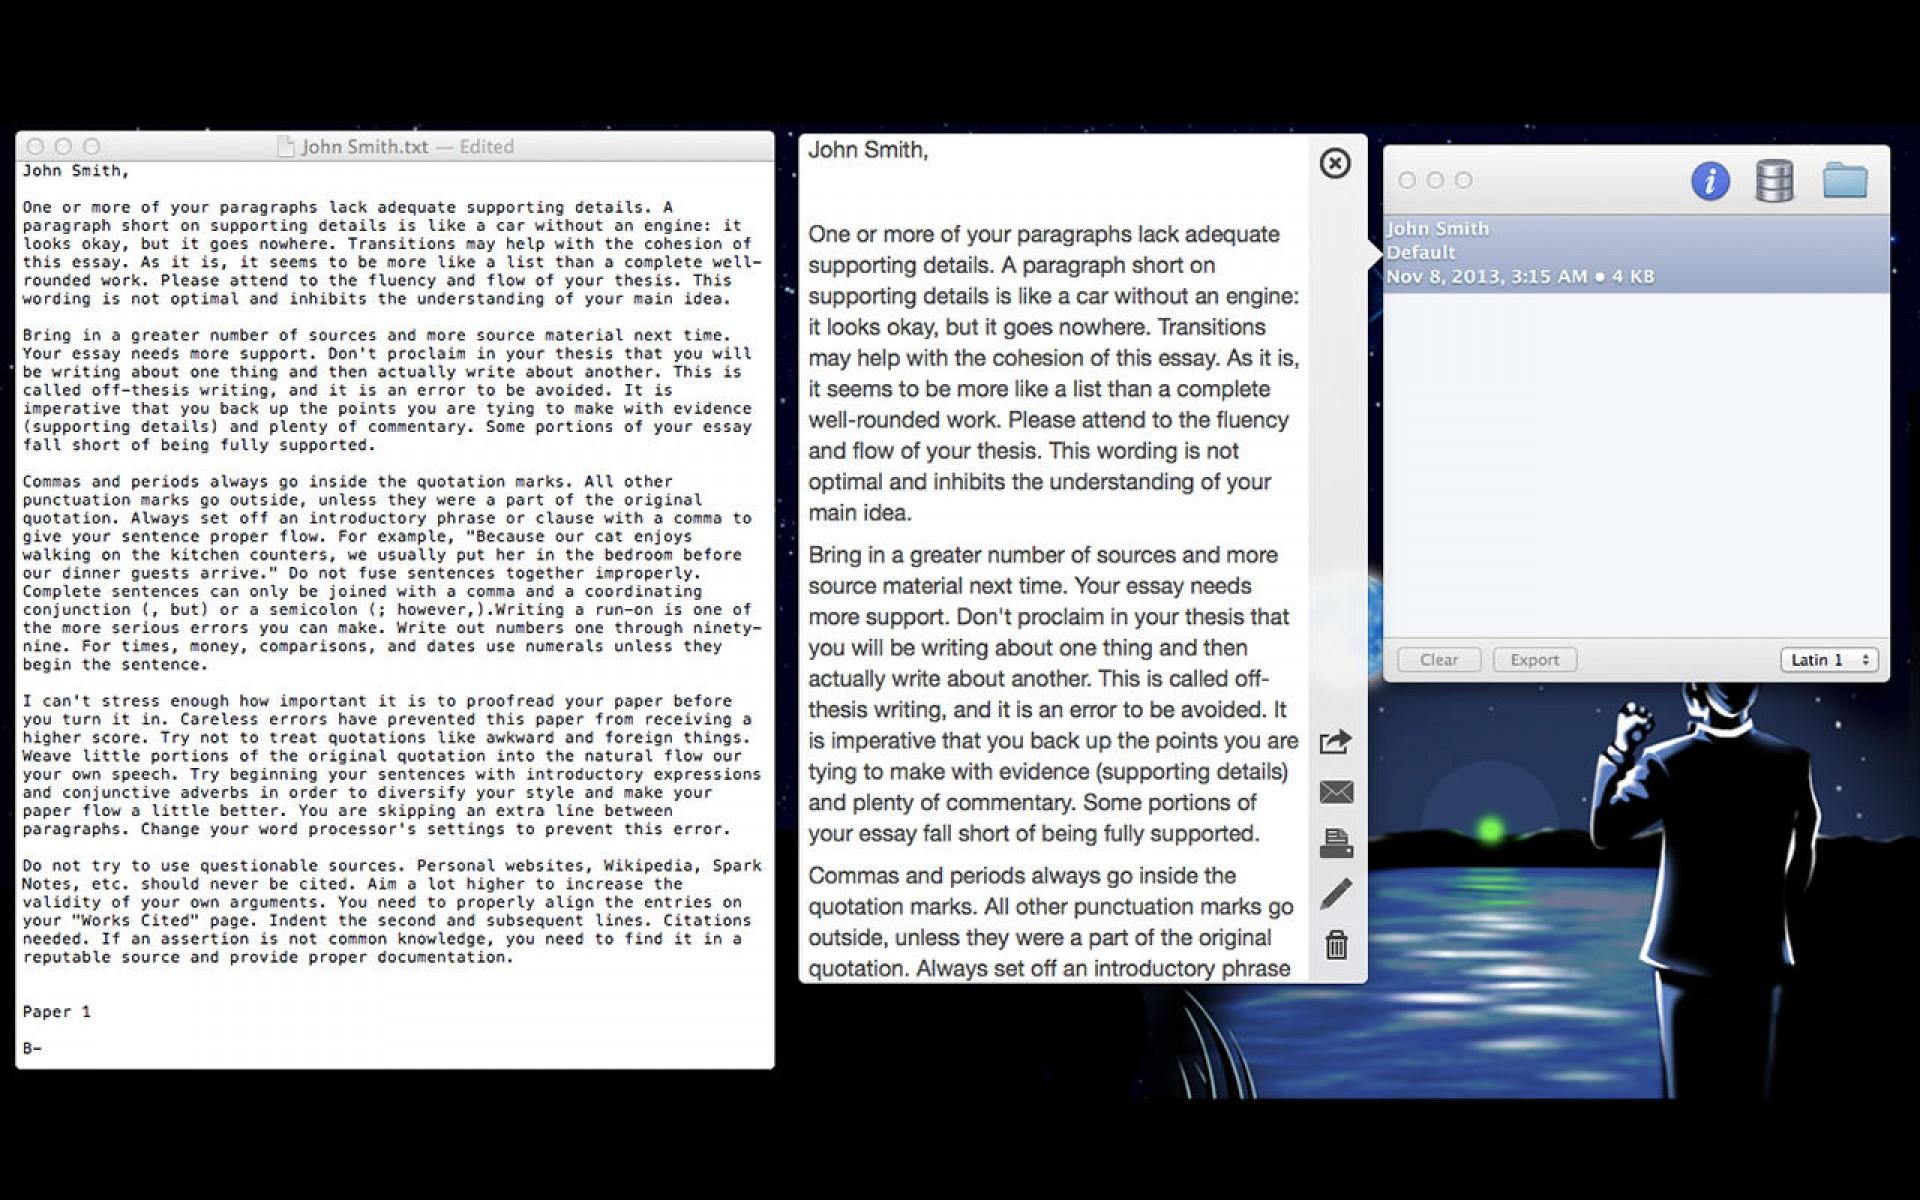 013 Essay Example Screen1280x800 Free Online Sensational Grader For Teachers Paper Students 1920